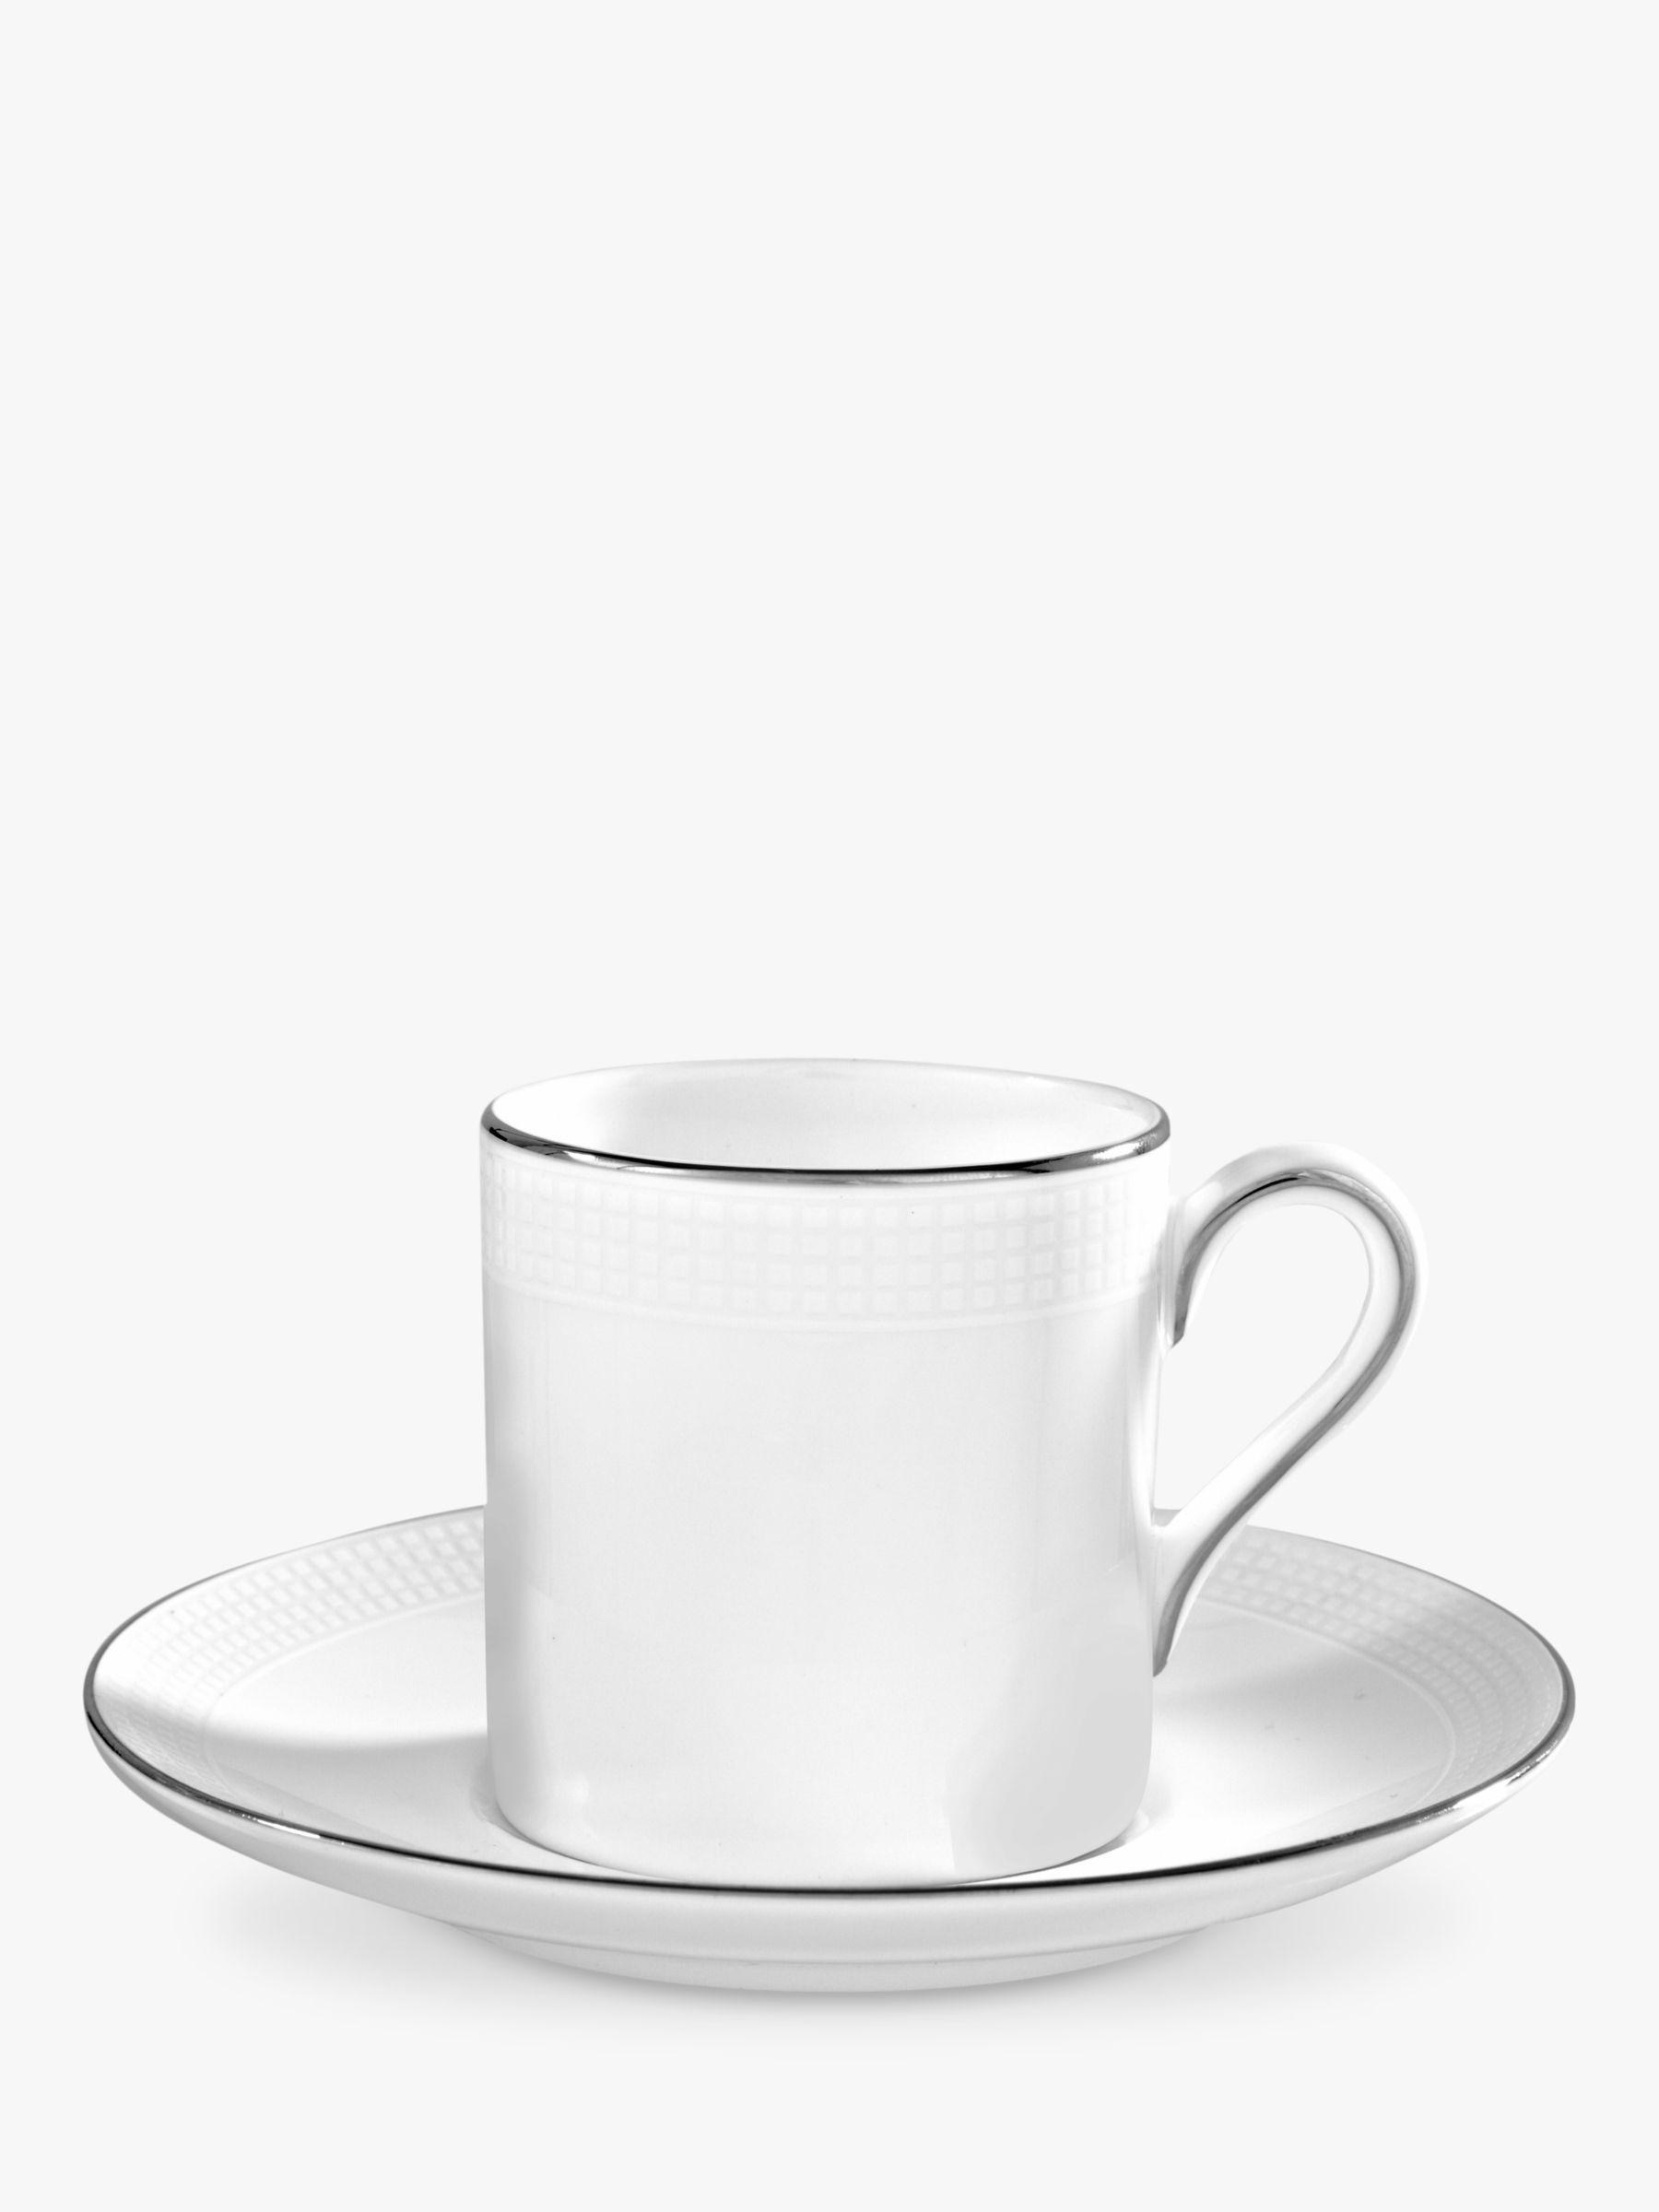 Vera Wang For Wedgwood Blanc Sur Blanc Espresso Saucer At John Lewis Partners